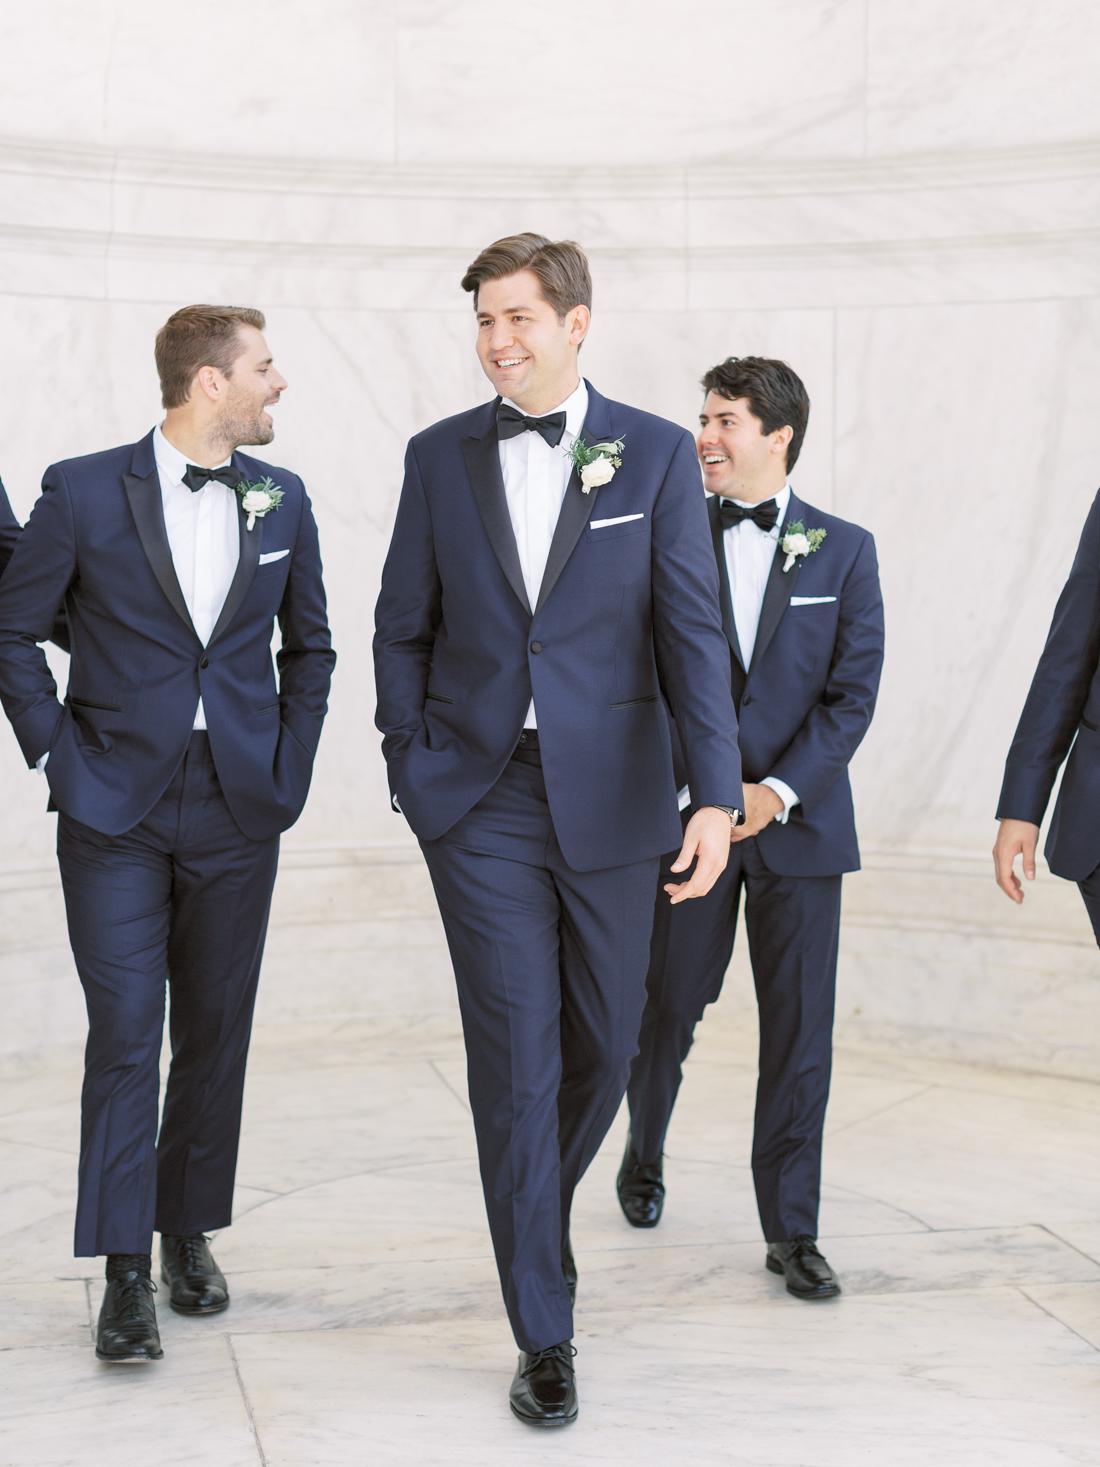 lapel-navy-grooms-tuxedo-washington-dc-wedding-photographer